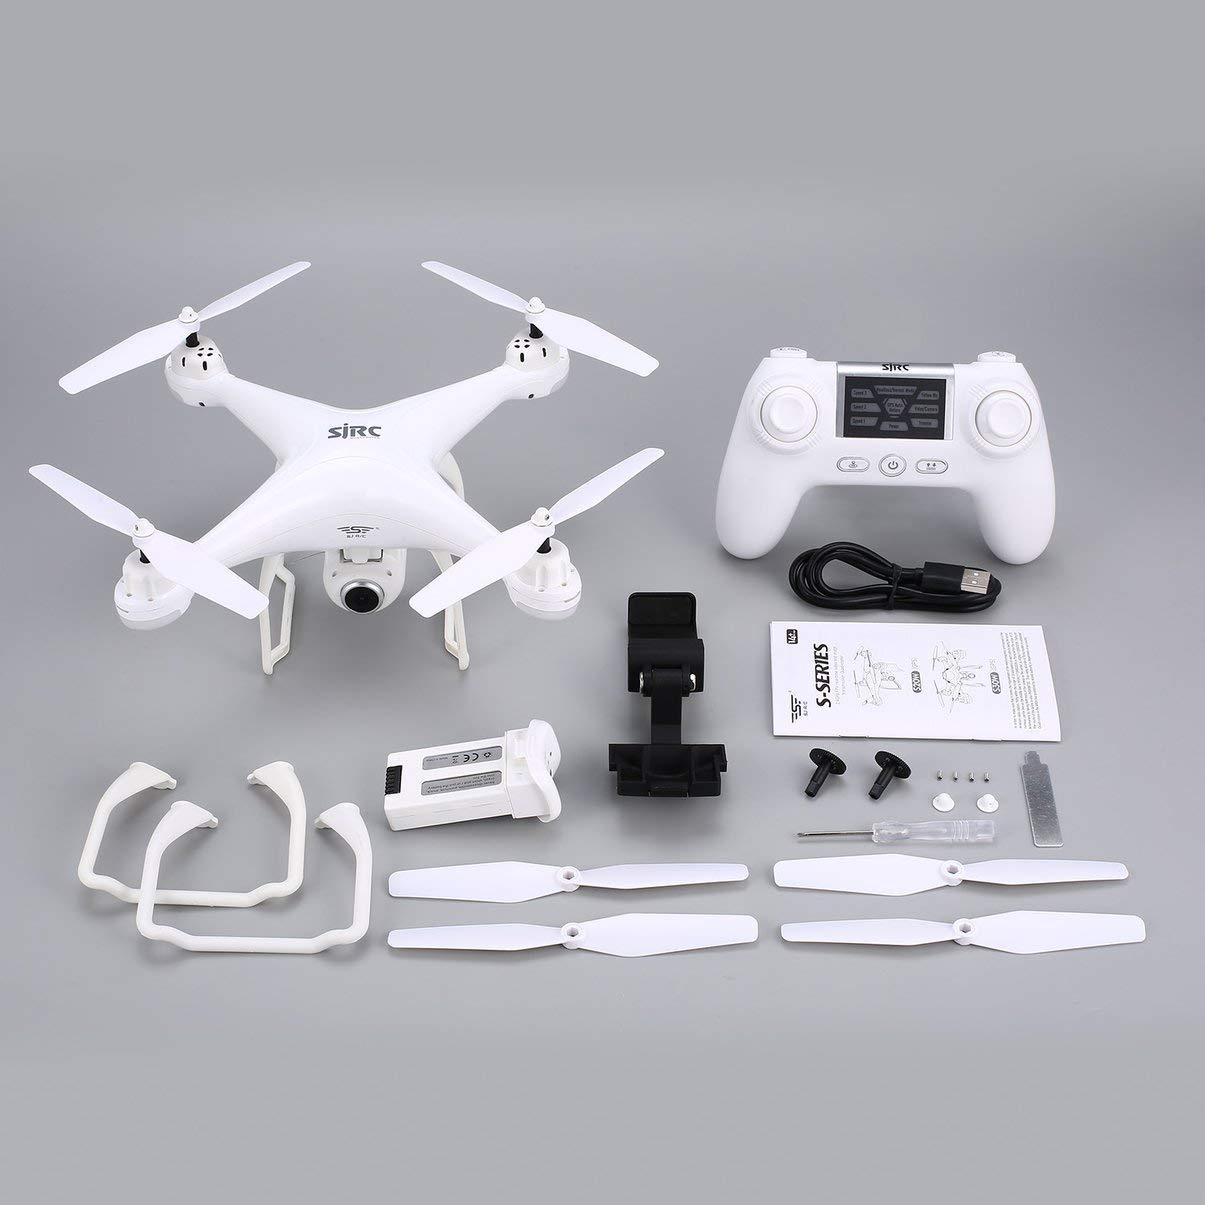 JullyeleESgant SJ R / C S20W FPV 720P Cámara Selfie Altitude Hold Drone Modo sin Cabeza Retorno automático Despegue / Aterrizaje Hover GPS RC Quadcopter